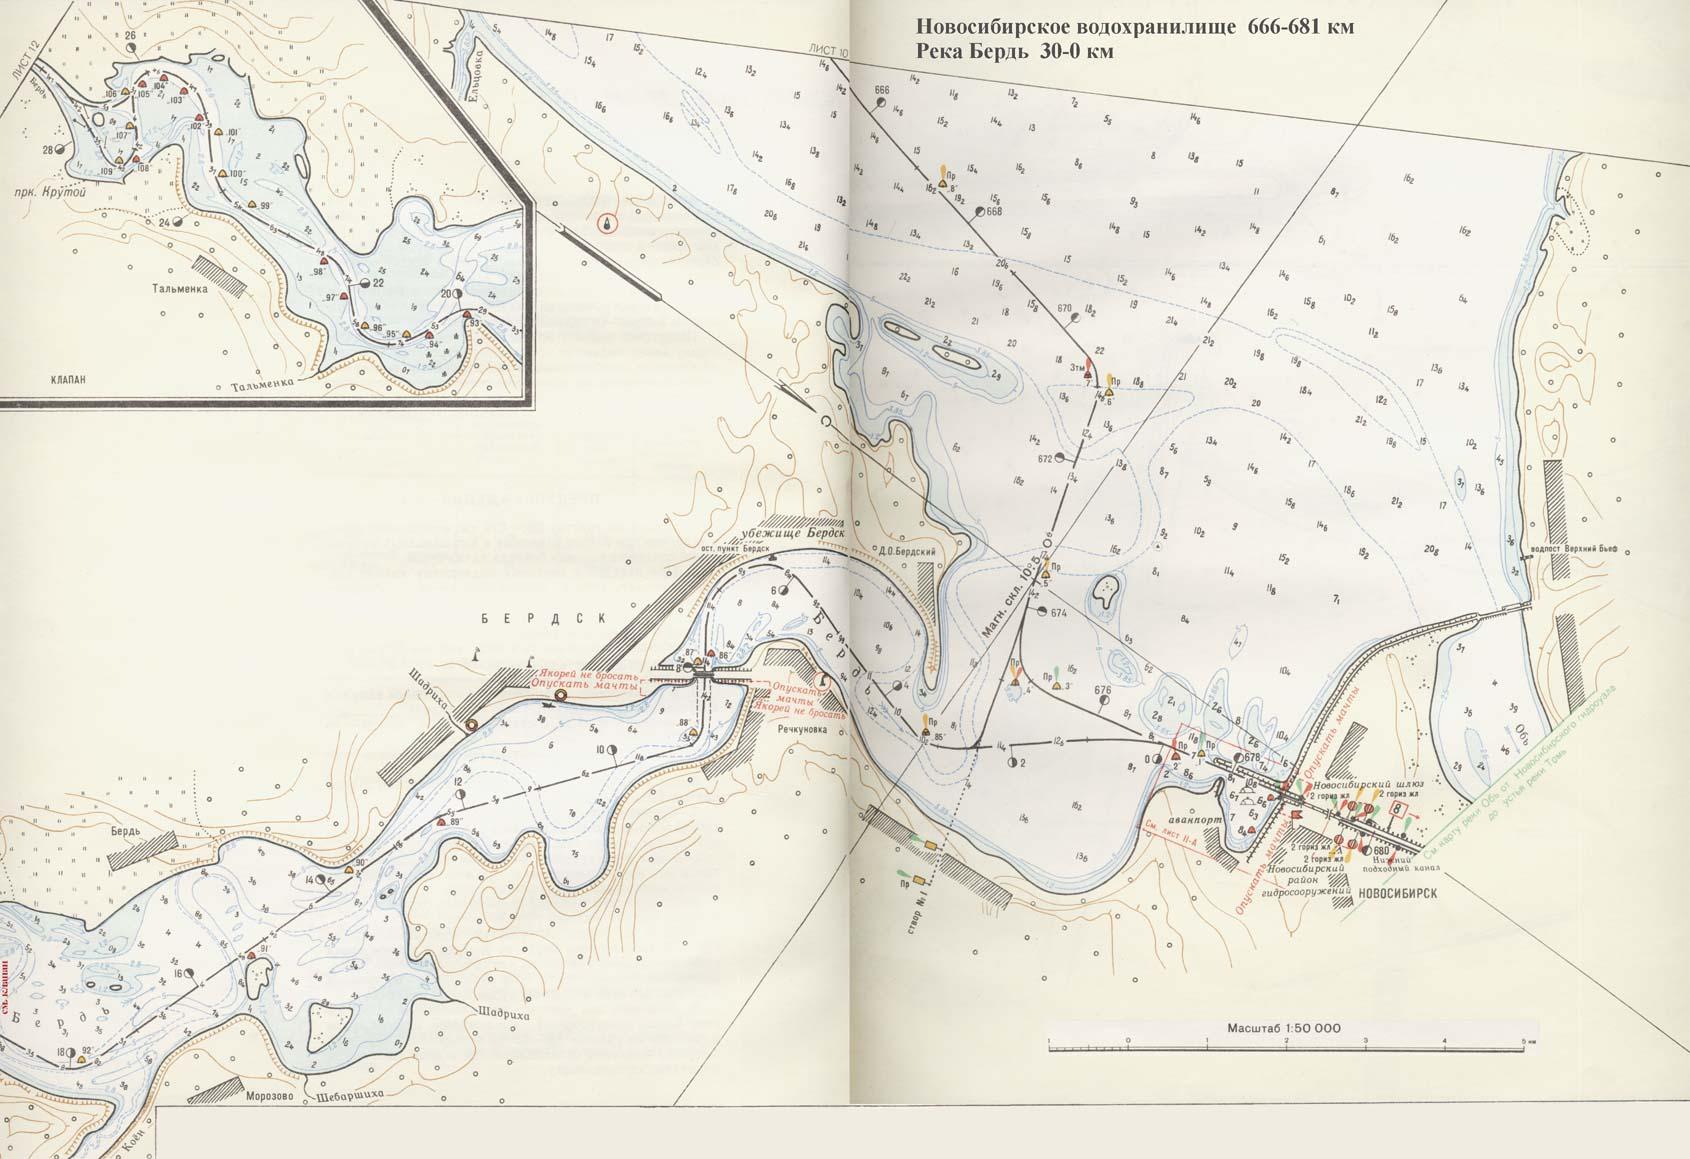 места для рыбалки в новосибирске на карте